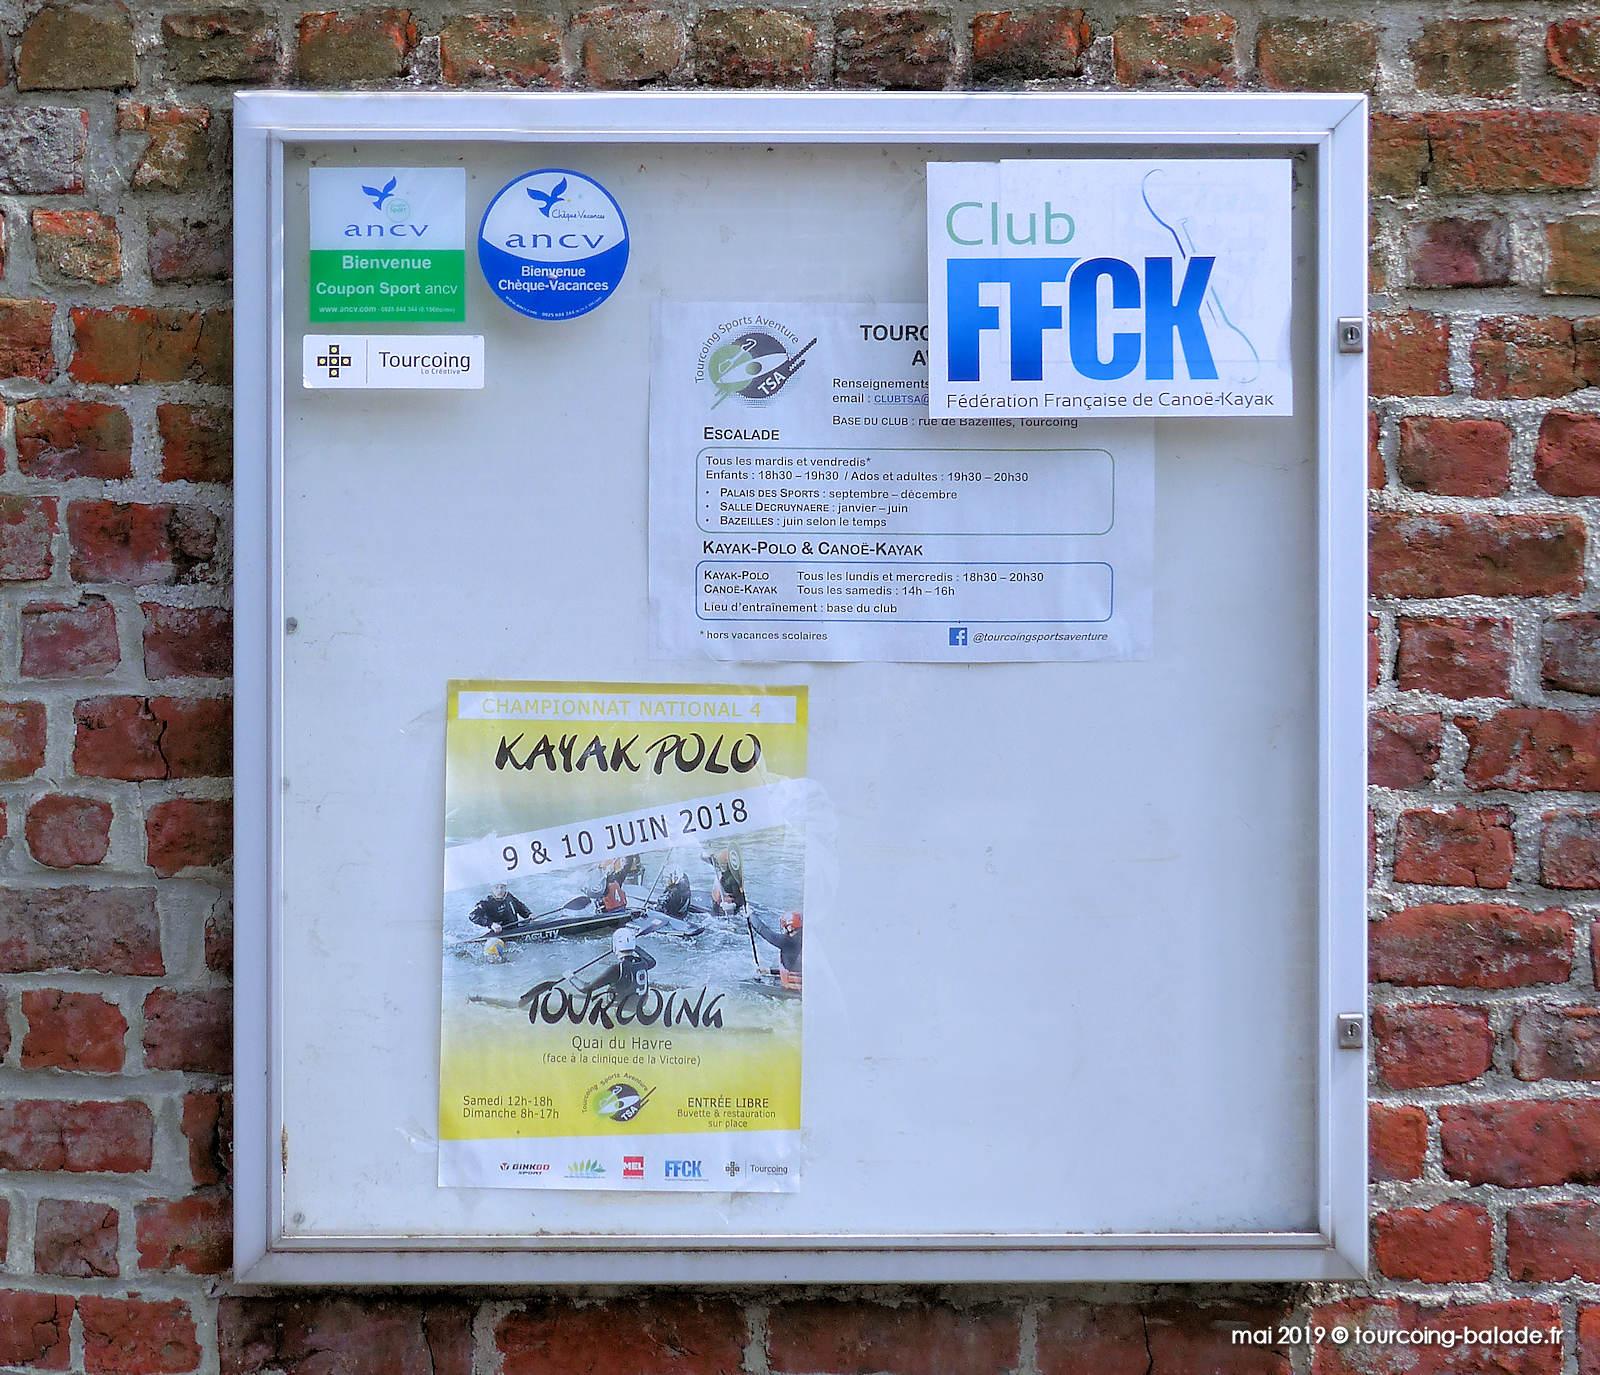 Club FFCK, Tourcoing 2020